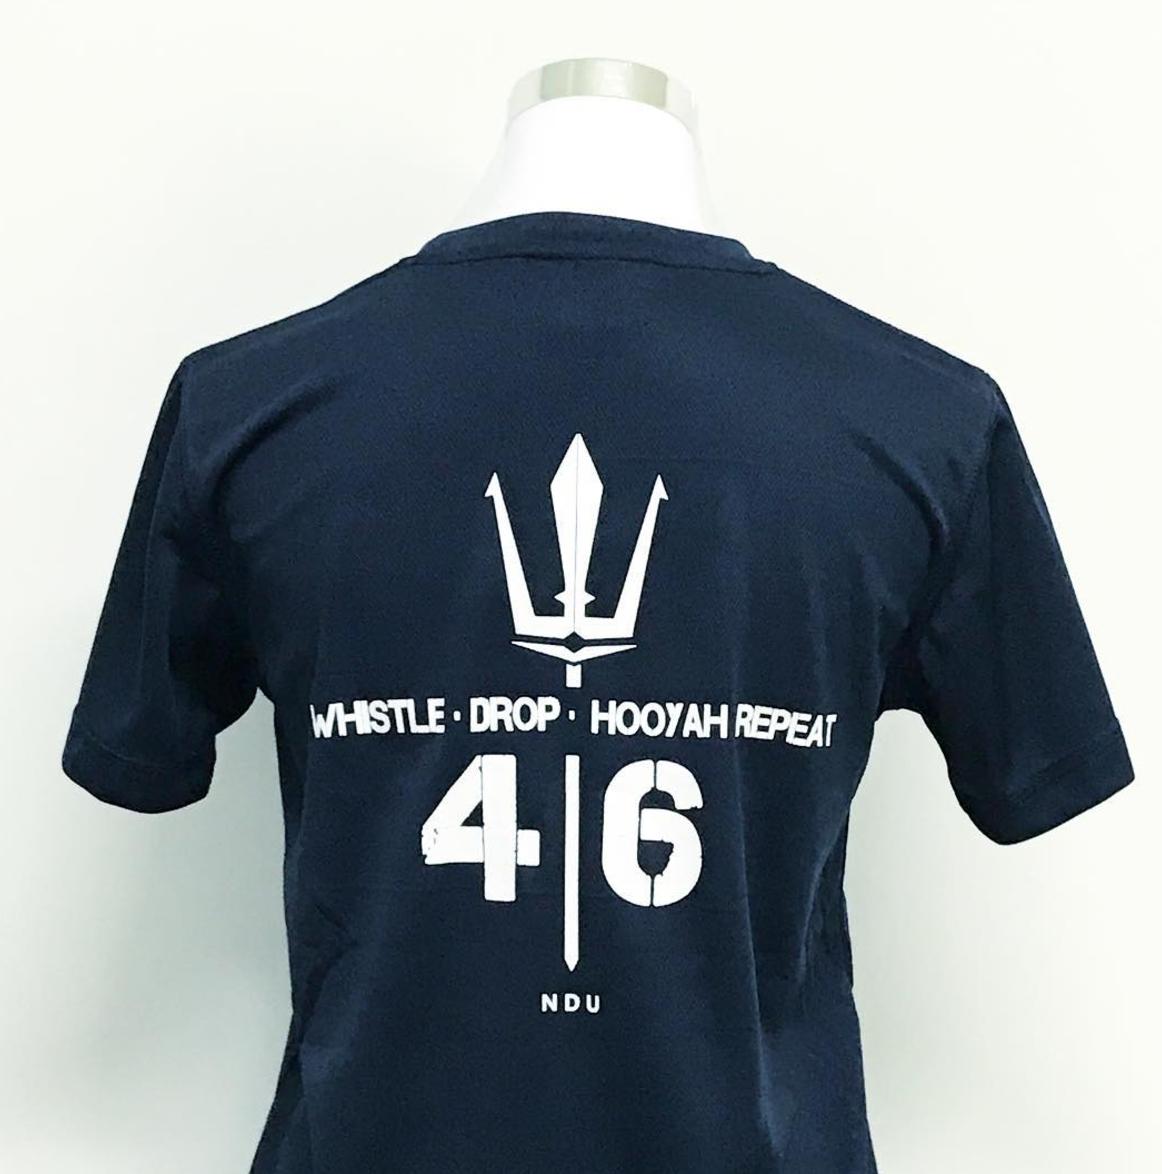 Customise ladies microfibre black t-shirt